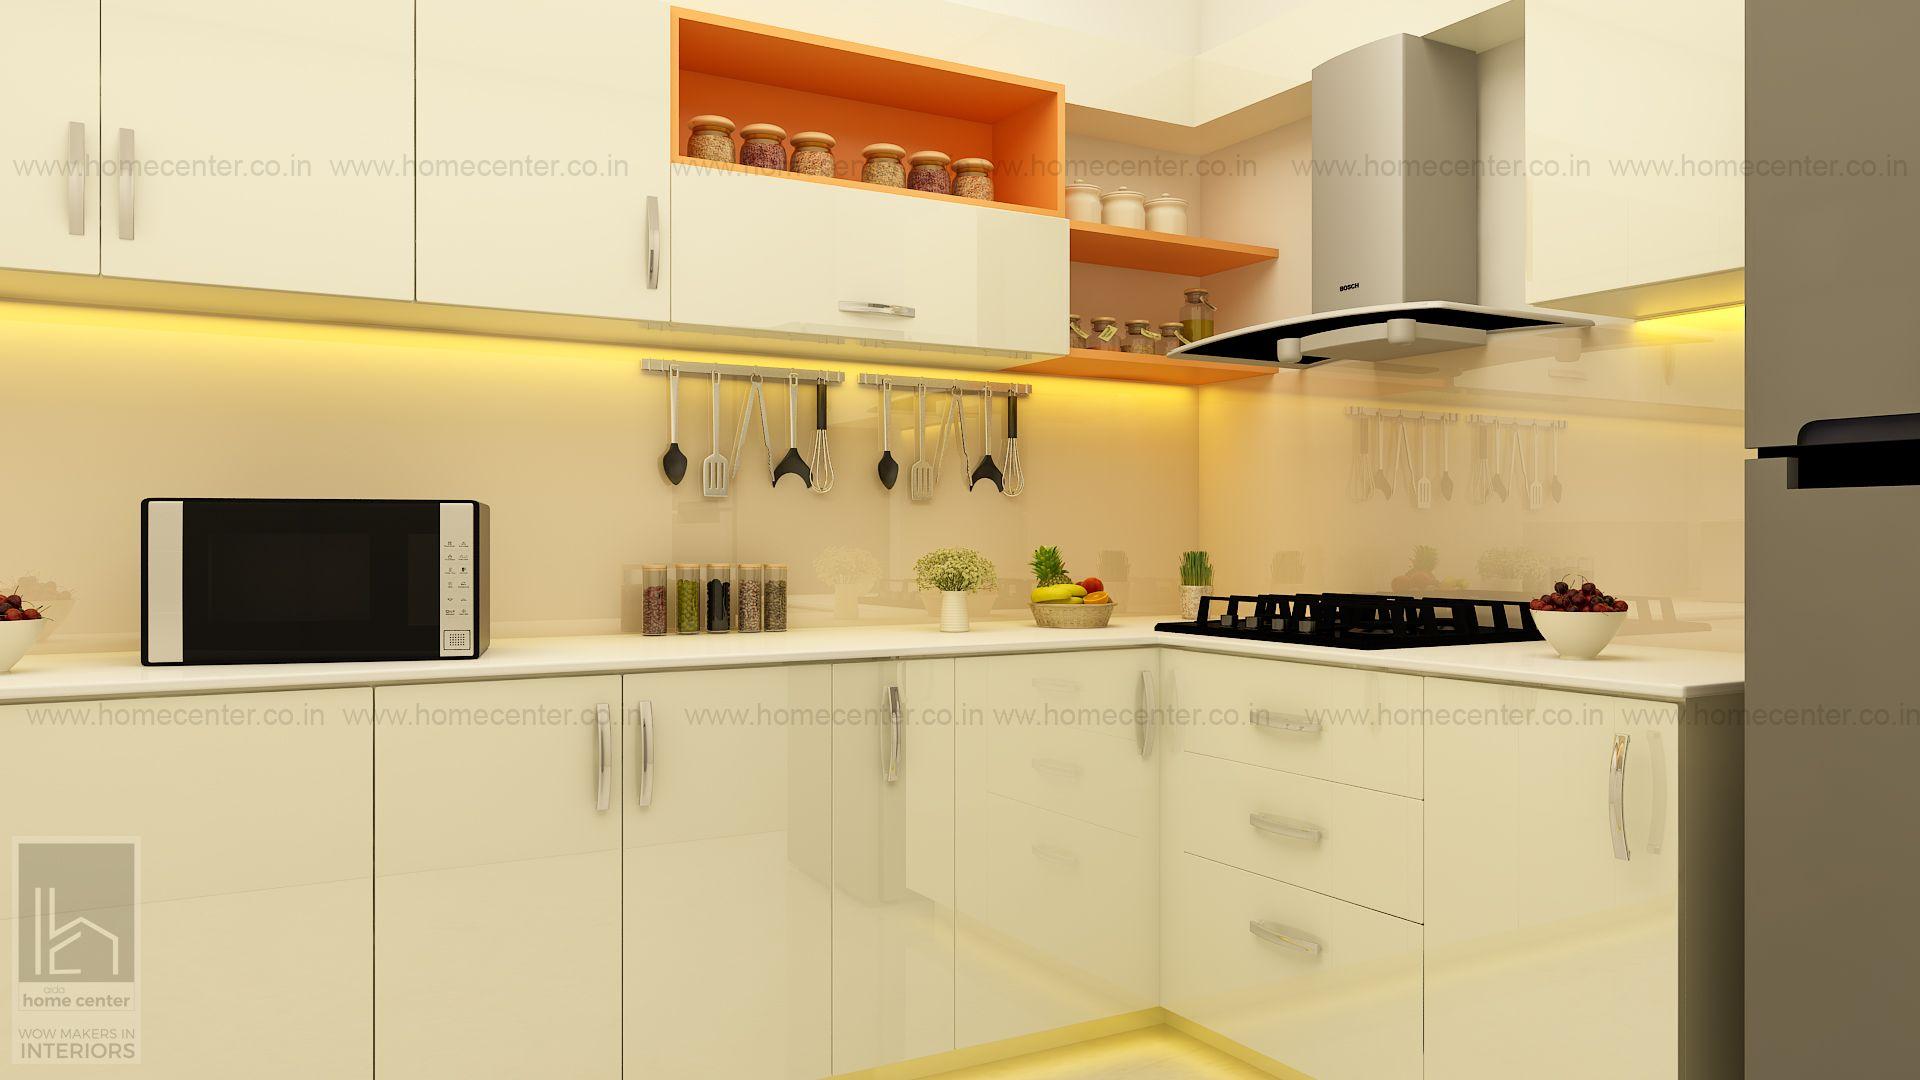 Modular kitchen designers in kerala  home center interiors